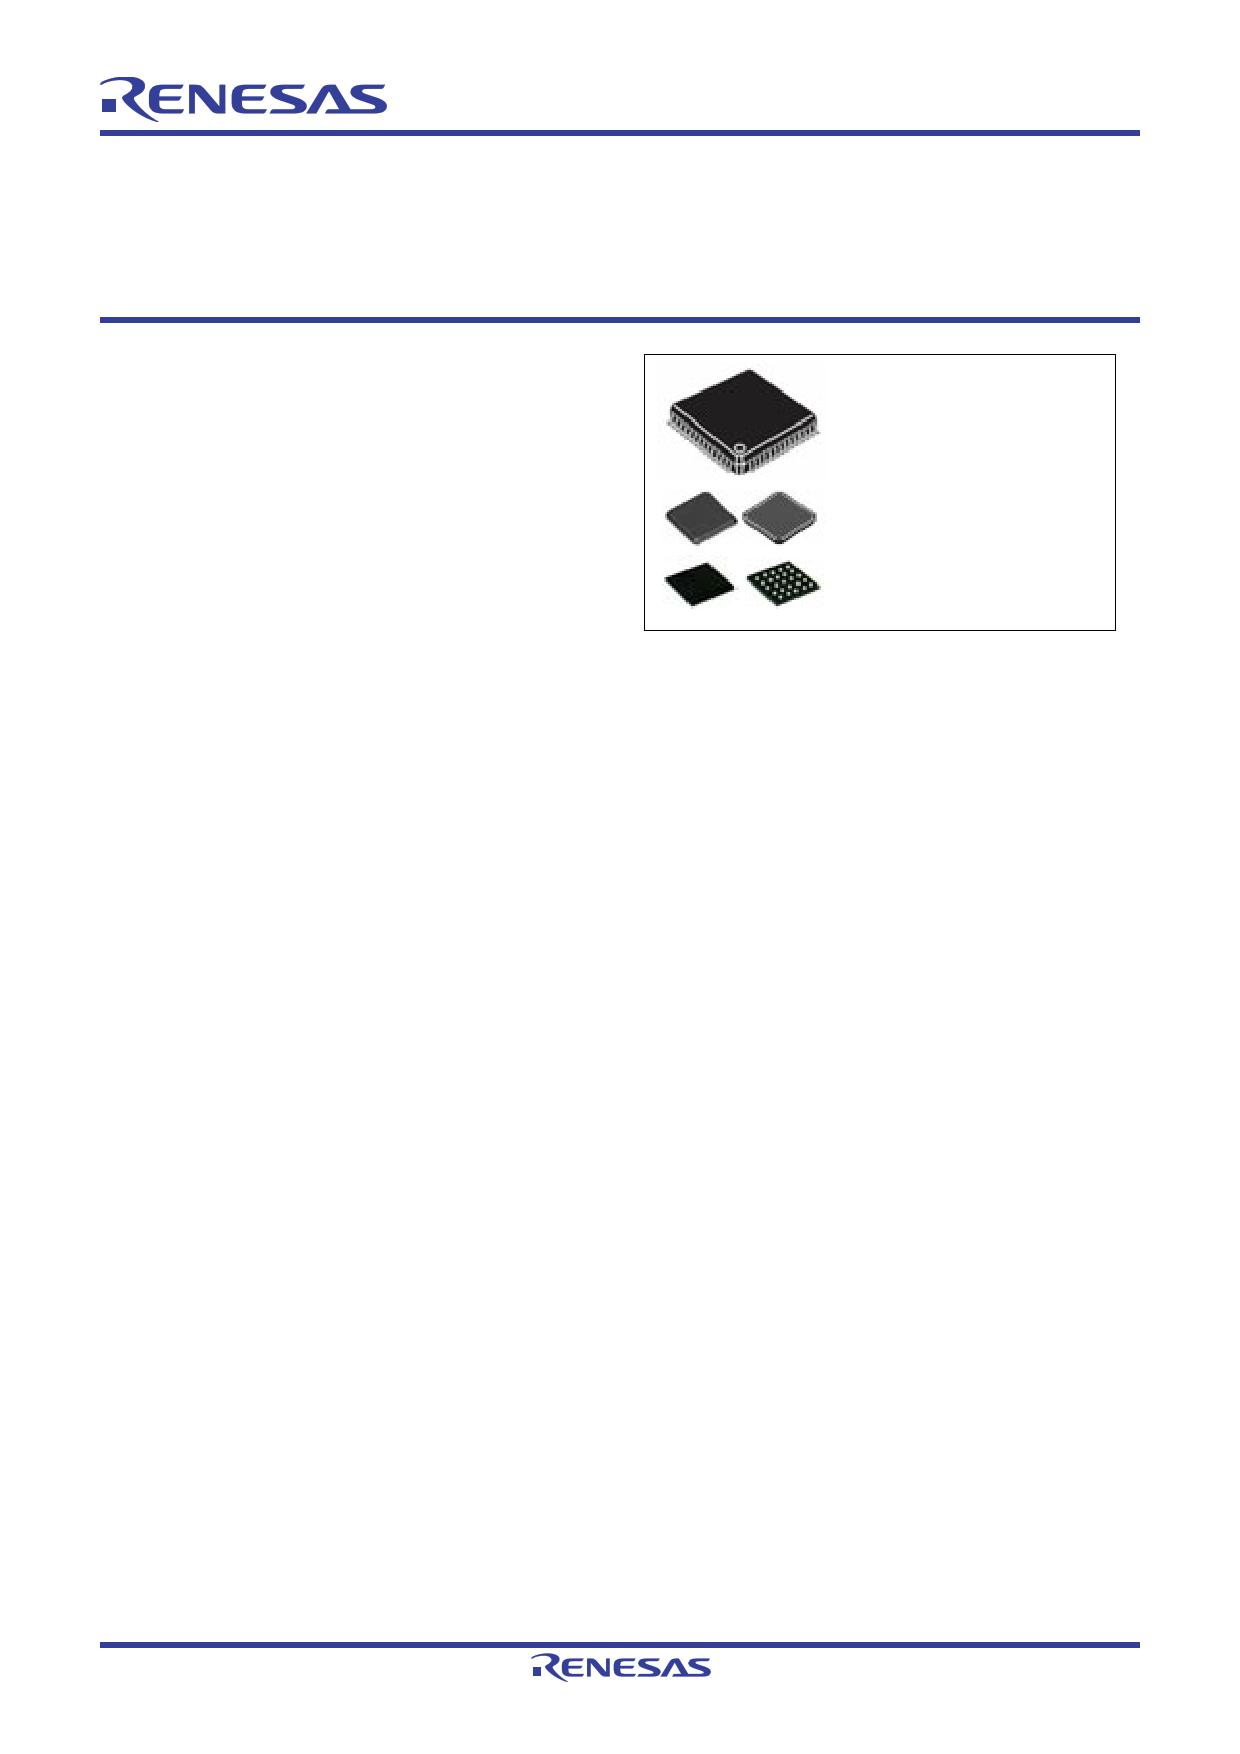 R5F51104ADLF 데이터시트 및 R5F51104ADLF PDF